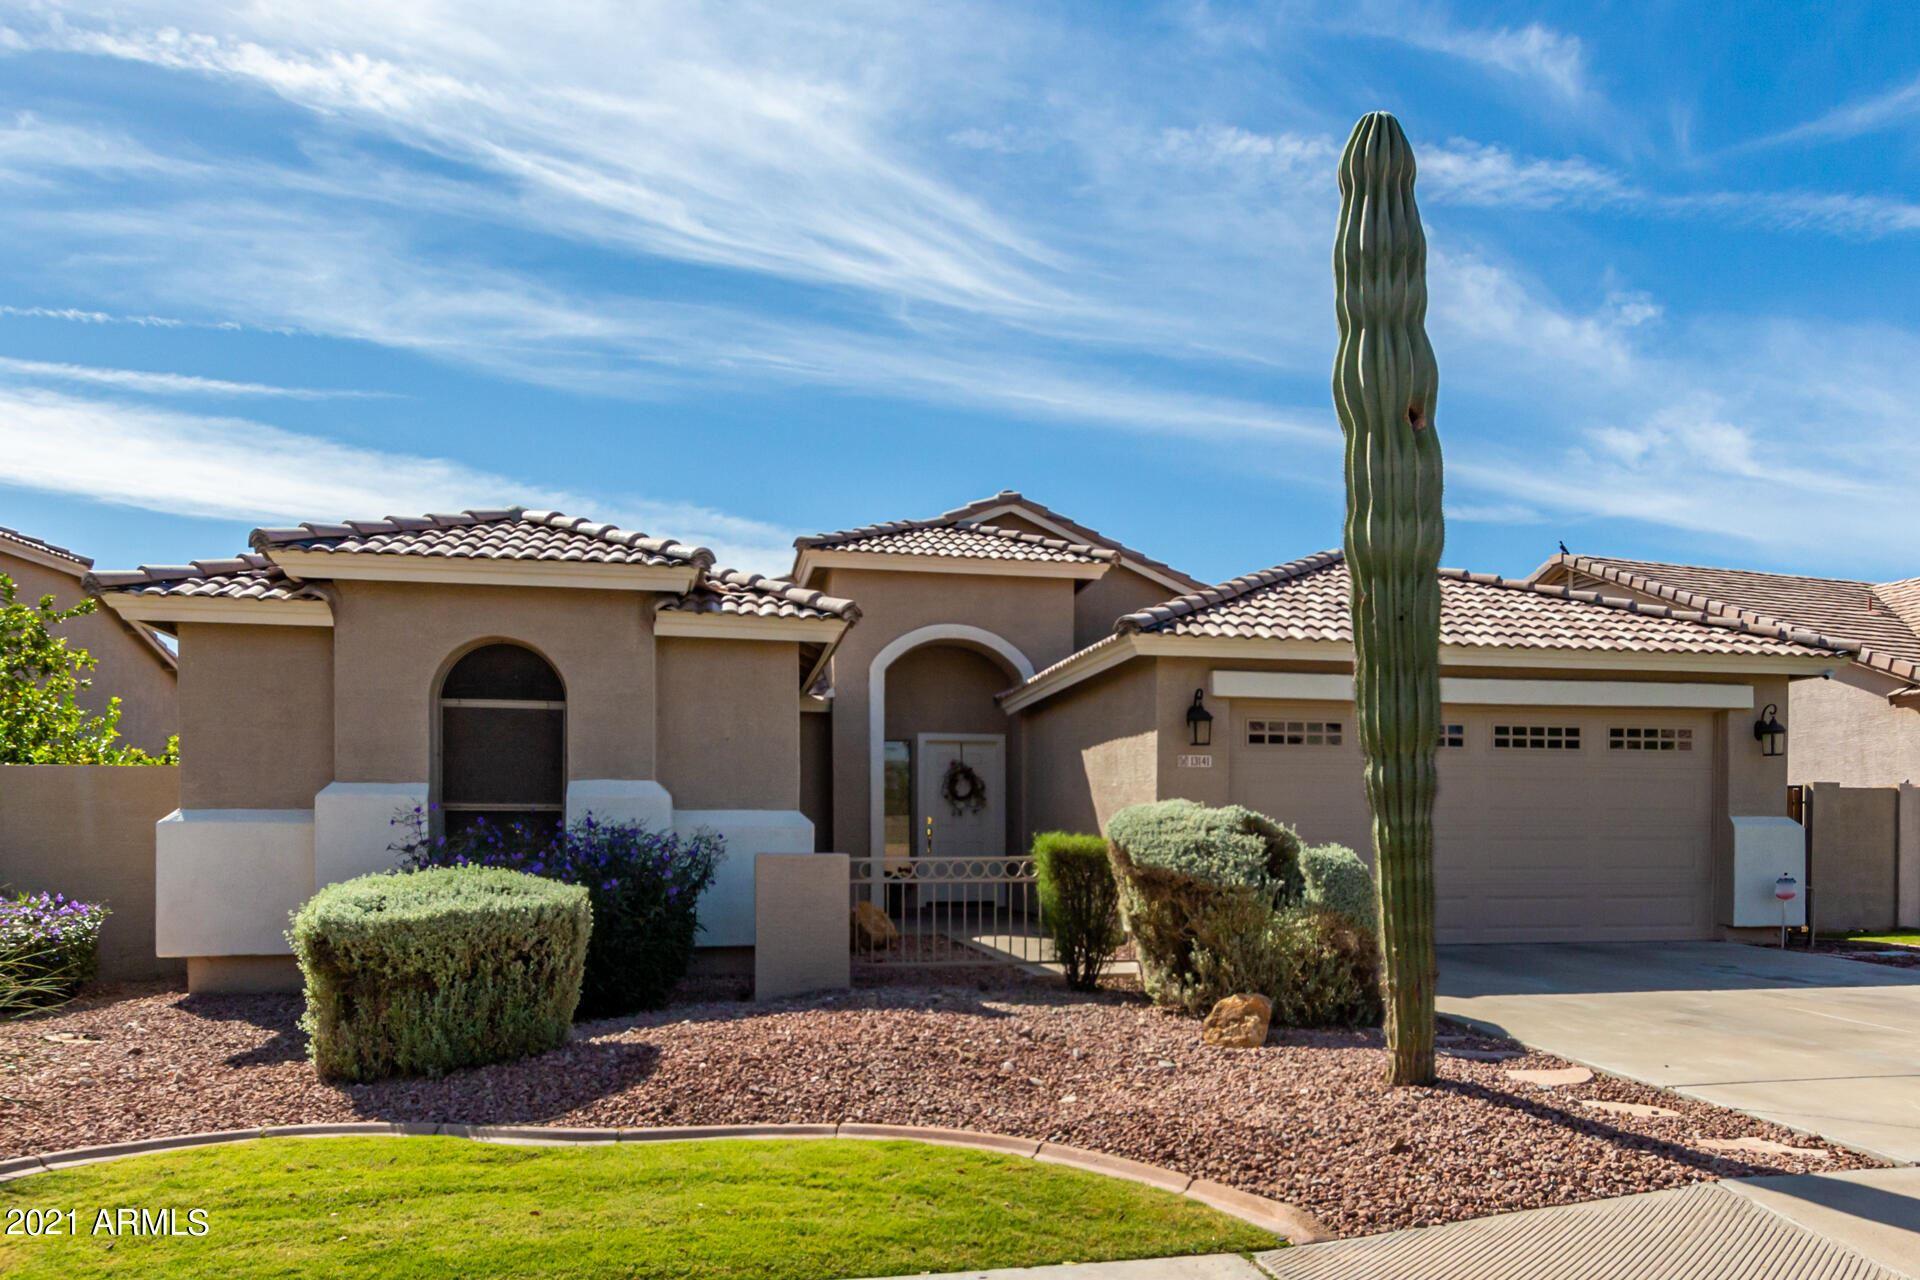 Photo of 13141 W STELLA Lane, Litchfield Park, AZ 85340 (MLS # 6310776)